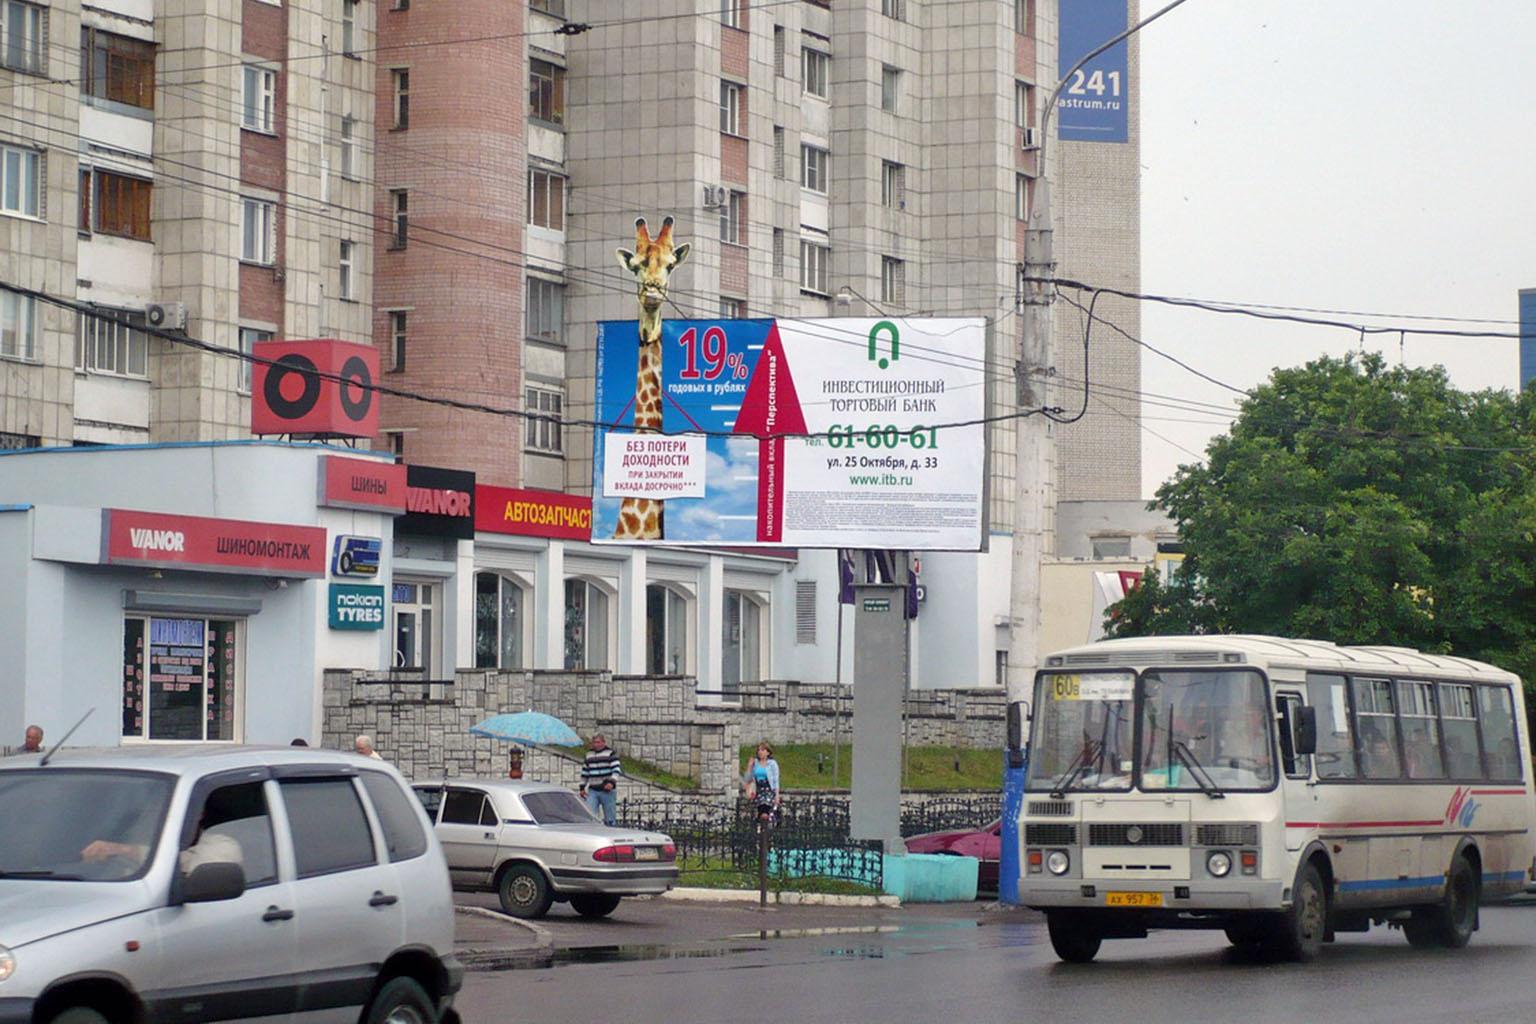 «Без потери доходности» с «ИнвестТорг Банком» - билборд Ленинский пр-т - ул. Димитрова